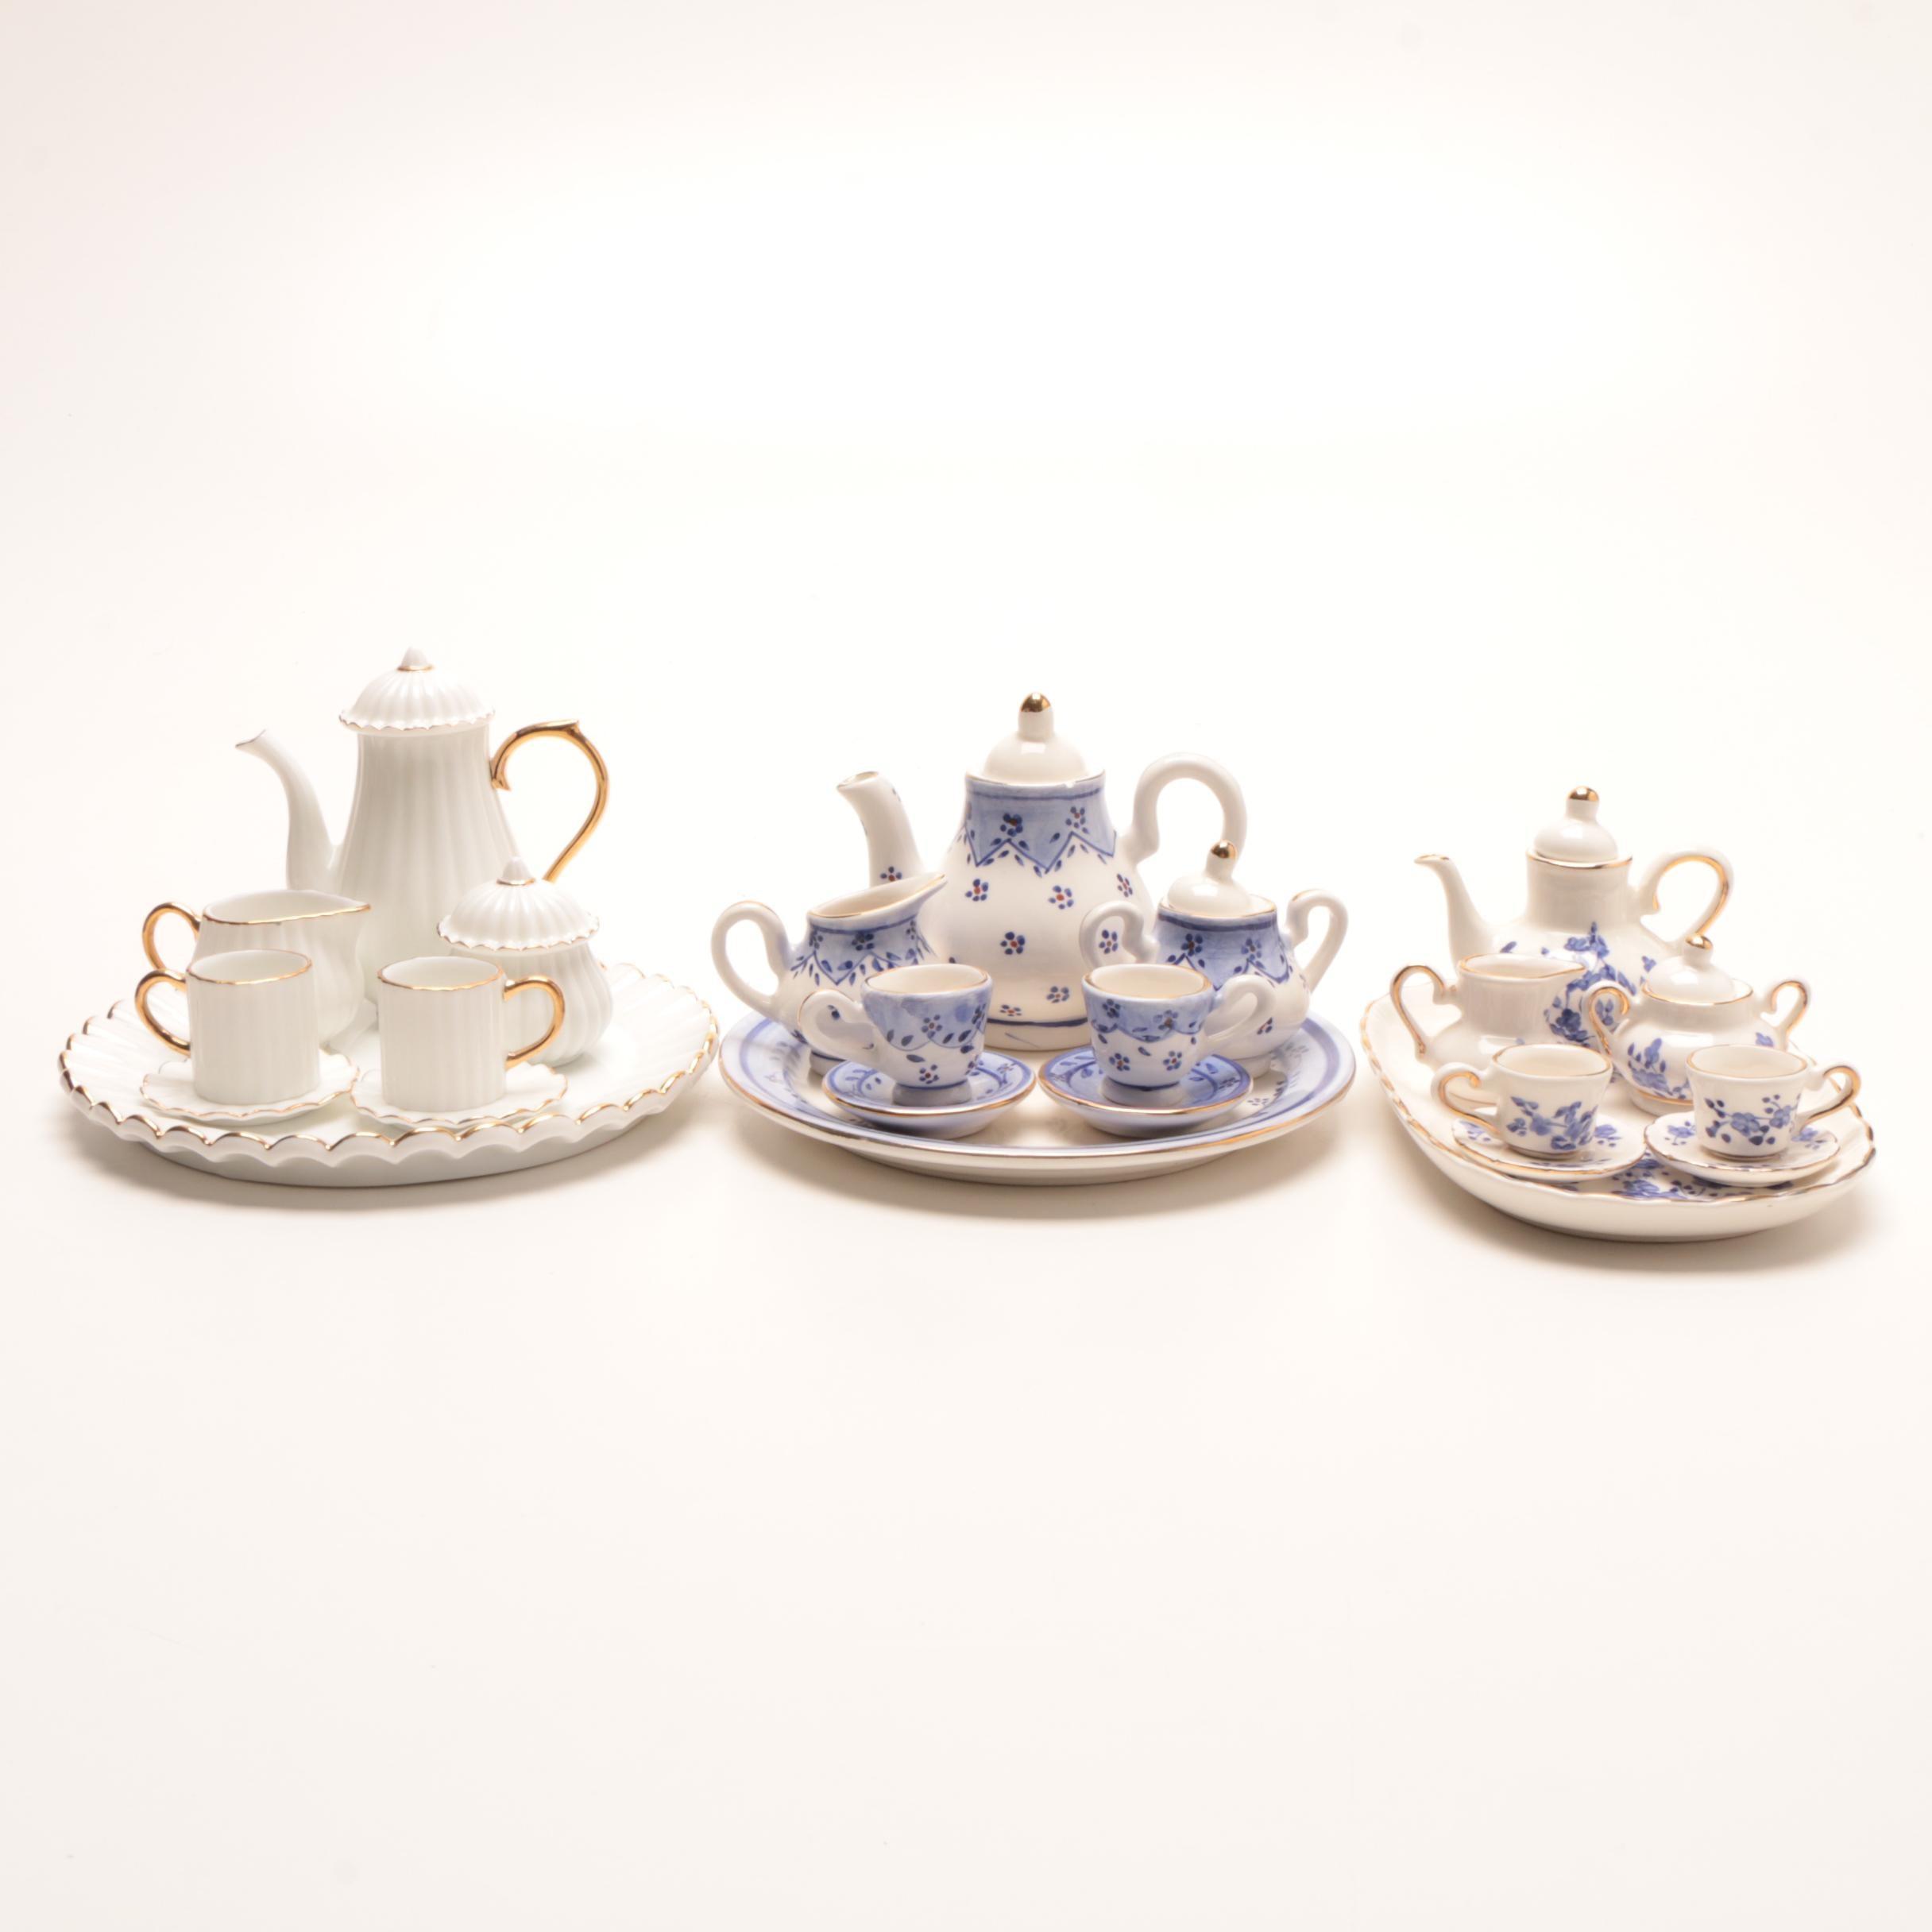 Three Miniature Porcelain Tea Sets